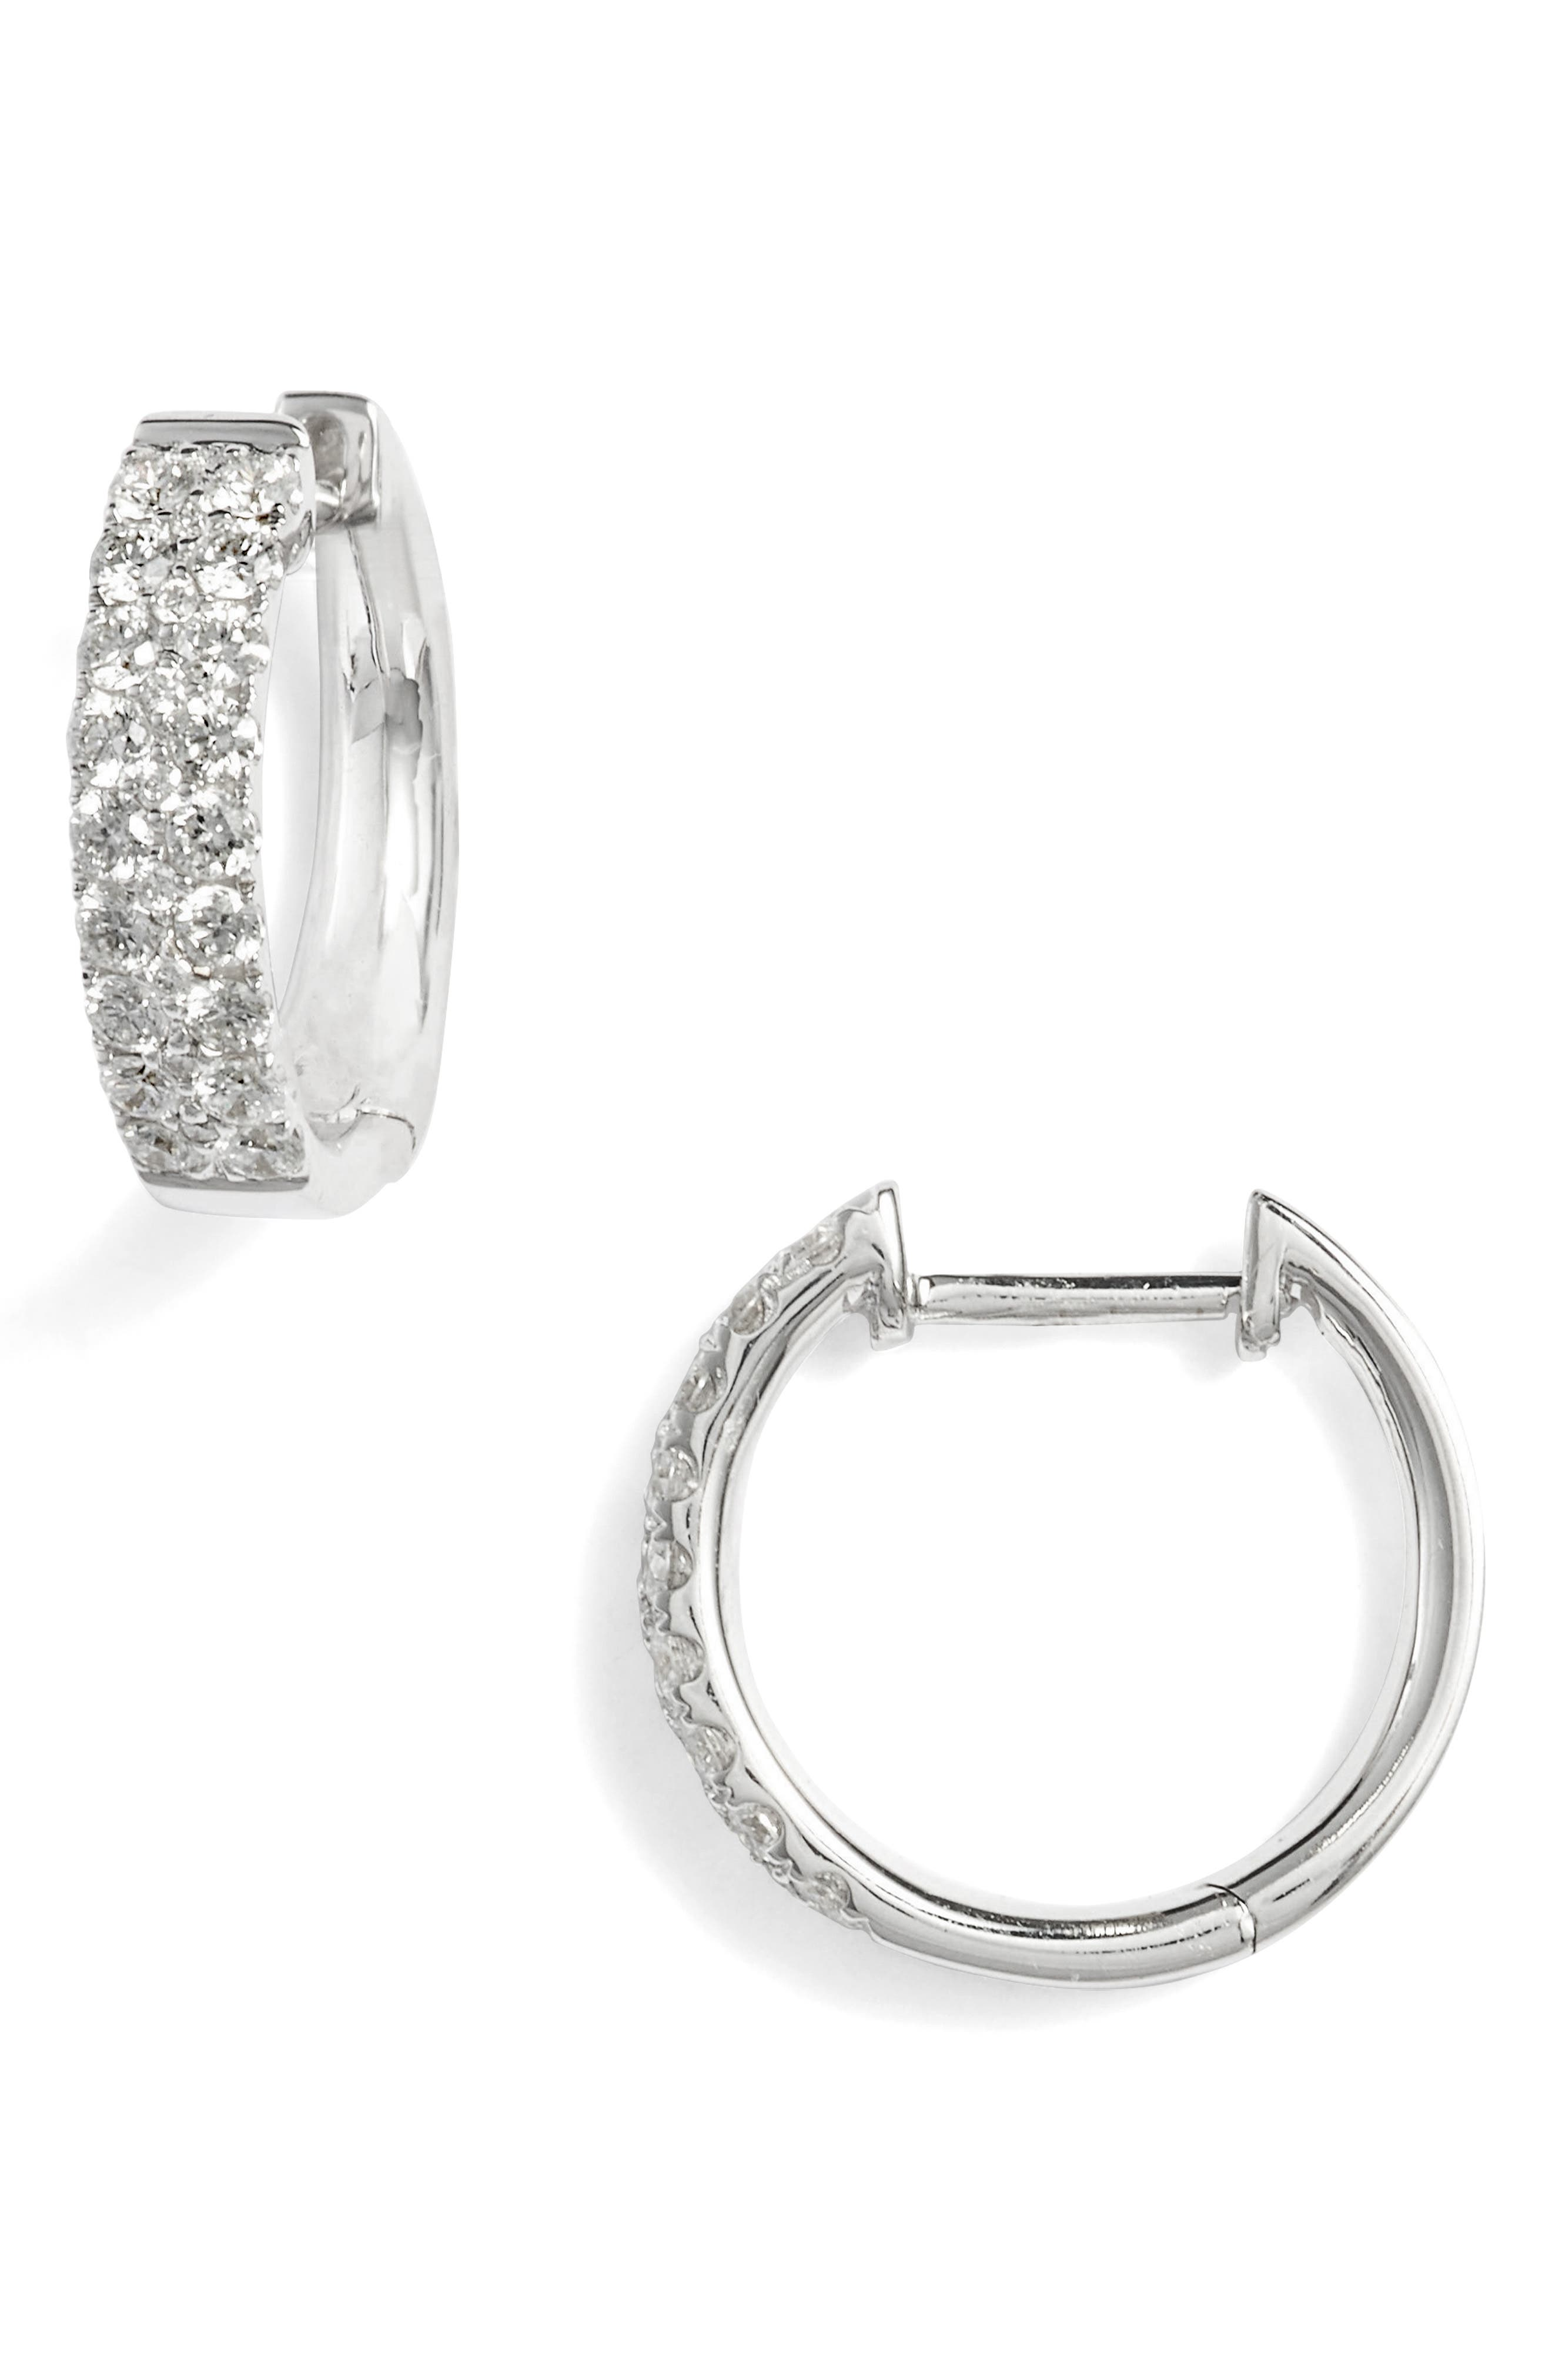 Kiera Small Diamond Hoop Earrings,                         Main,                         color,